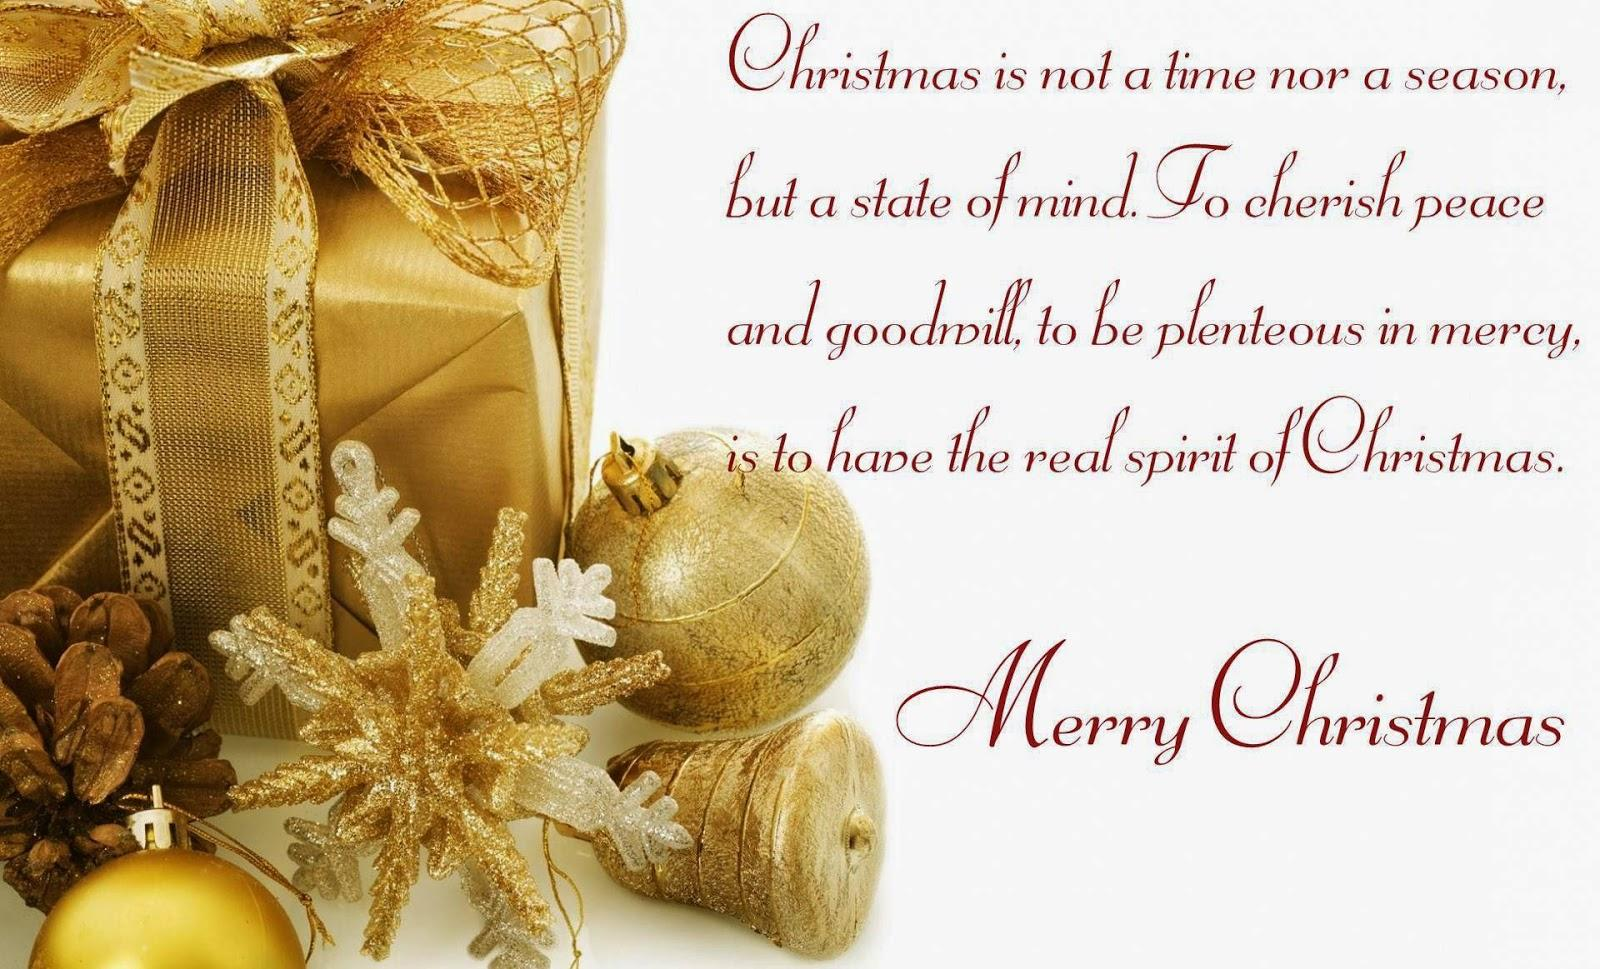 Merry christmas greetings message greetings1 merry christmas greetings message m4hsunfo